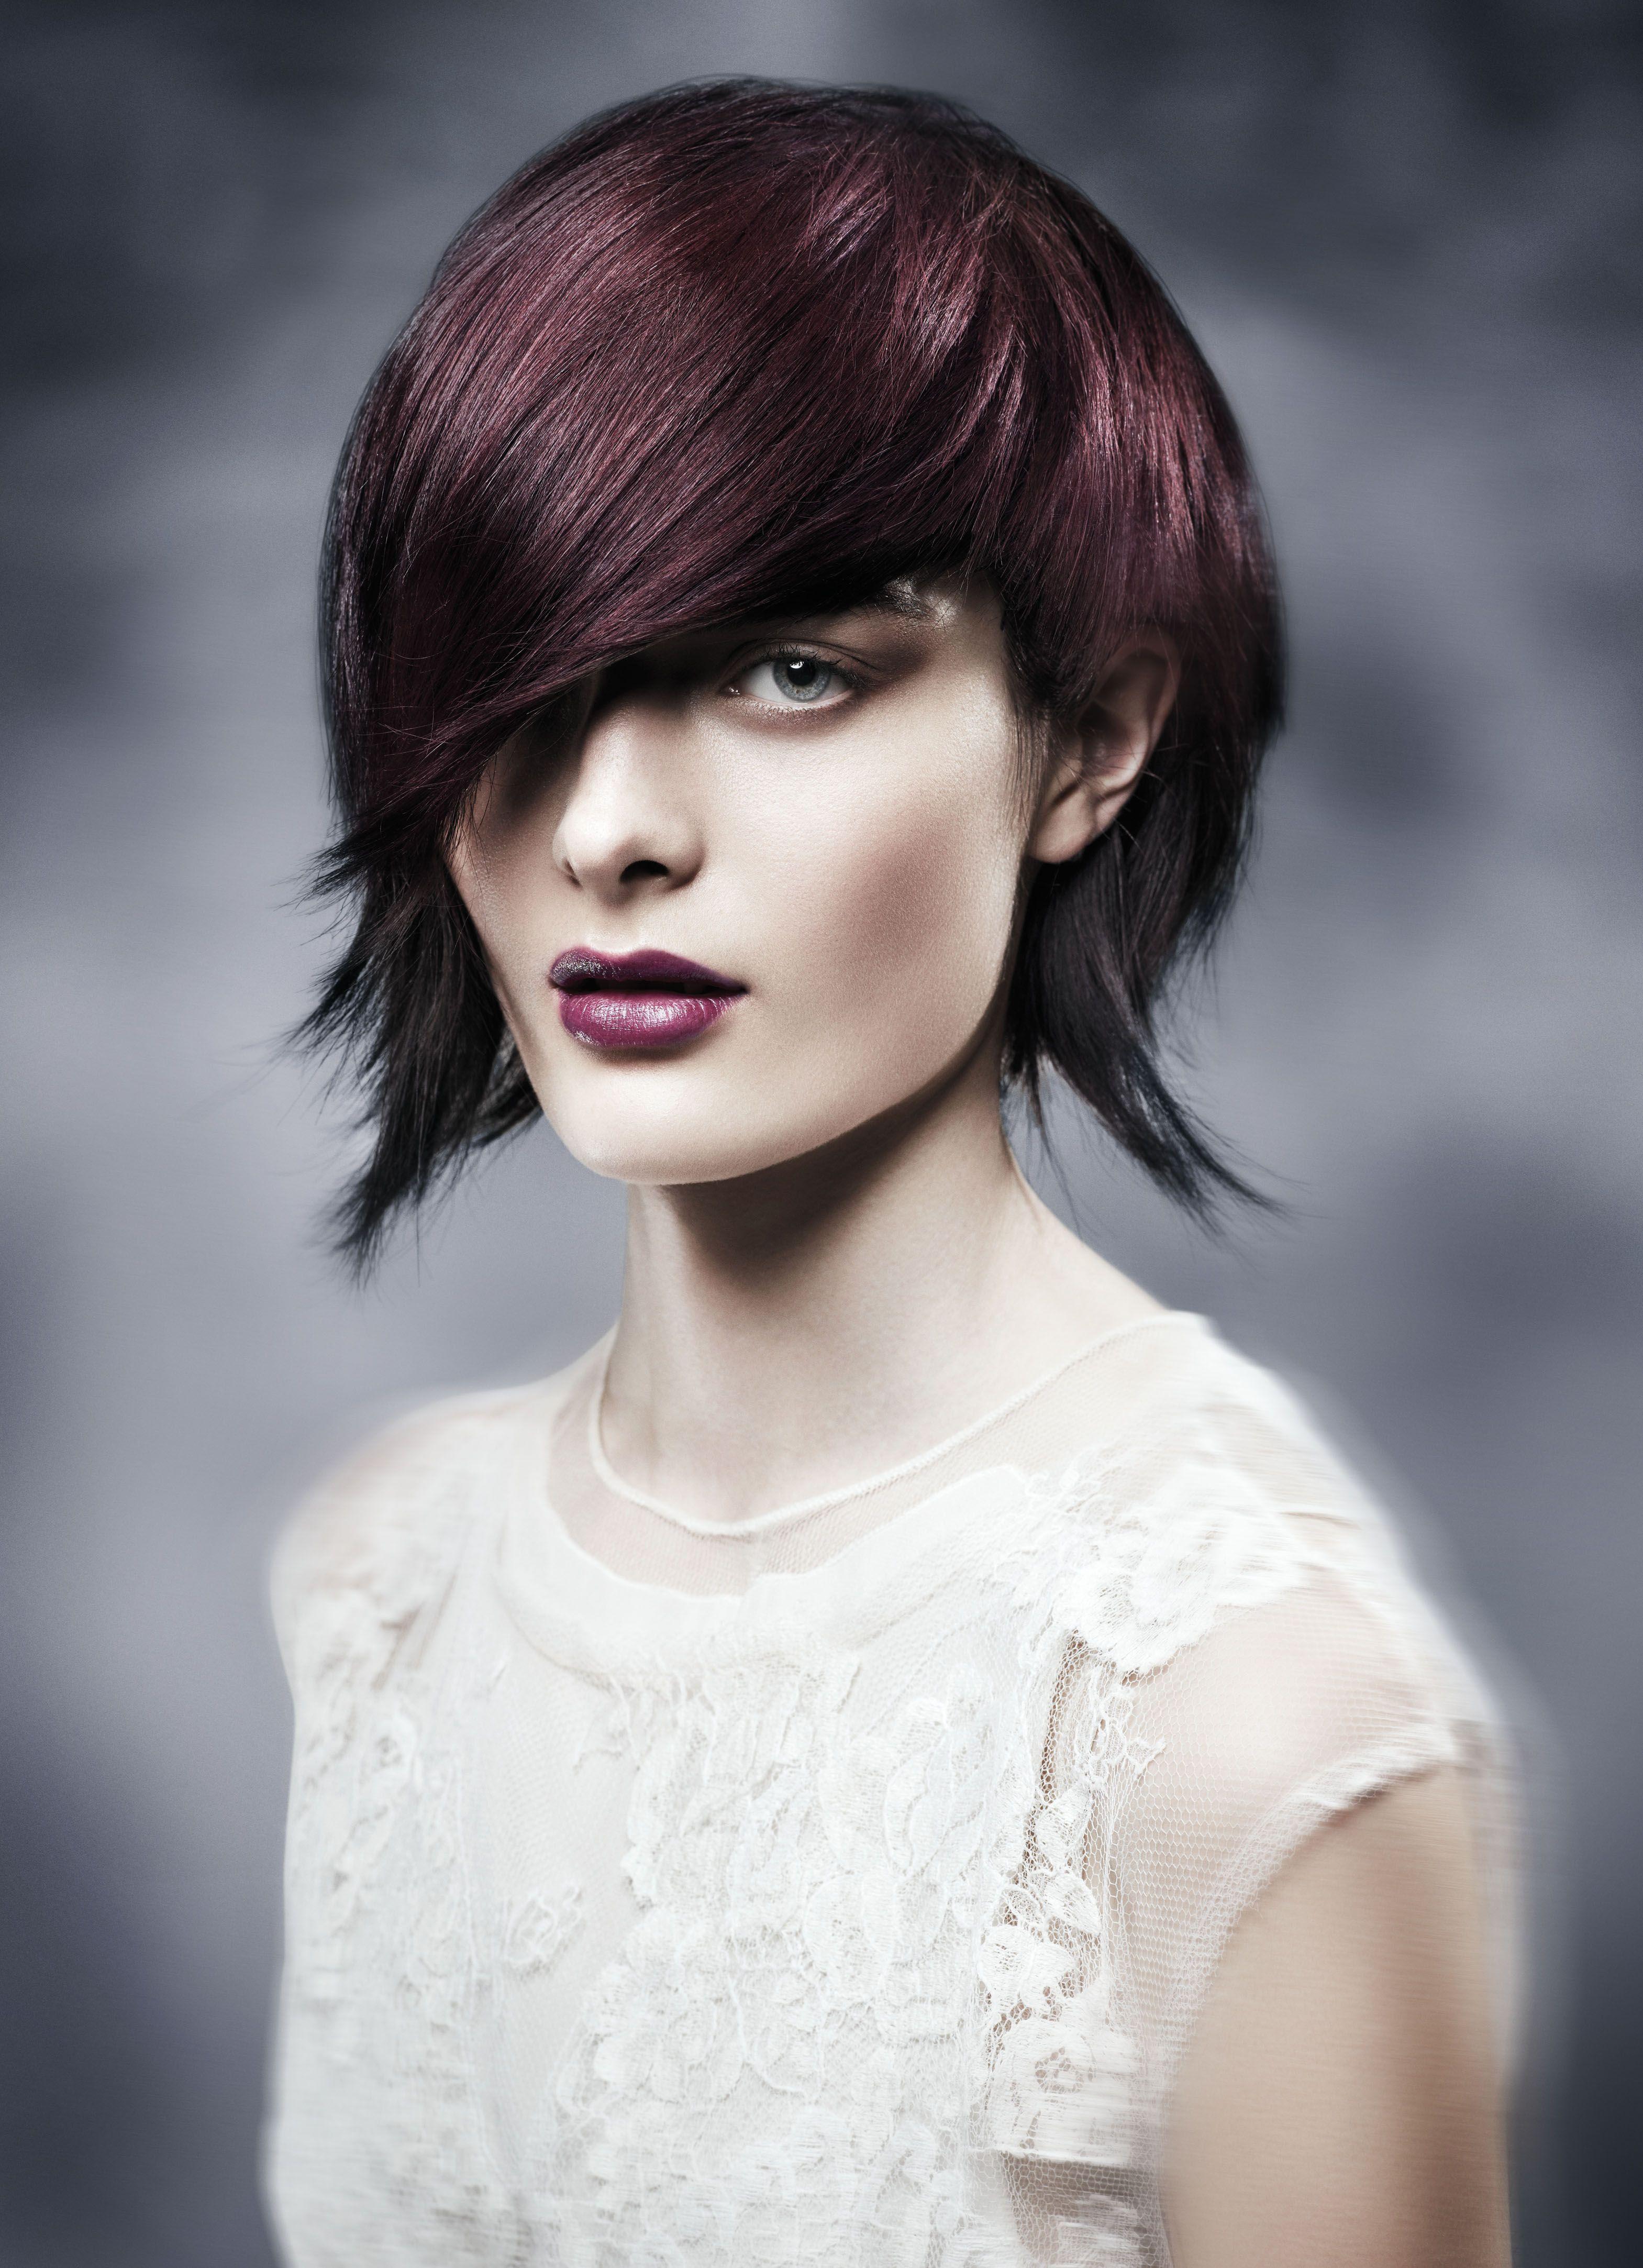 ft121096_r3_crop   Hair Style 2   Pinterest   Aveda hair color ...